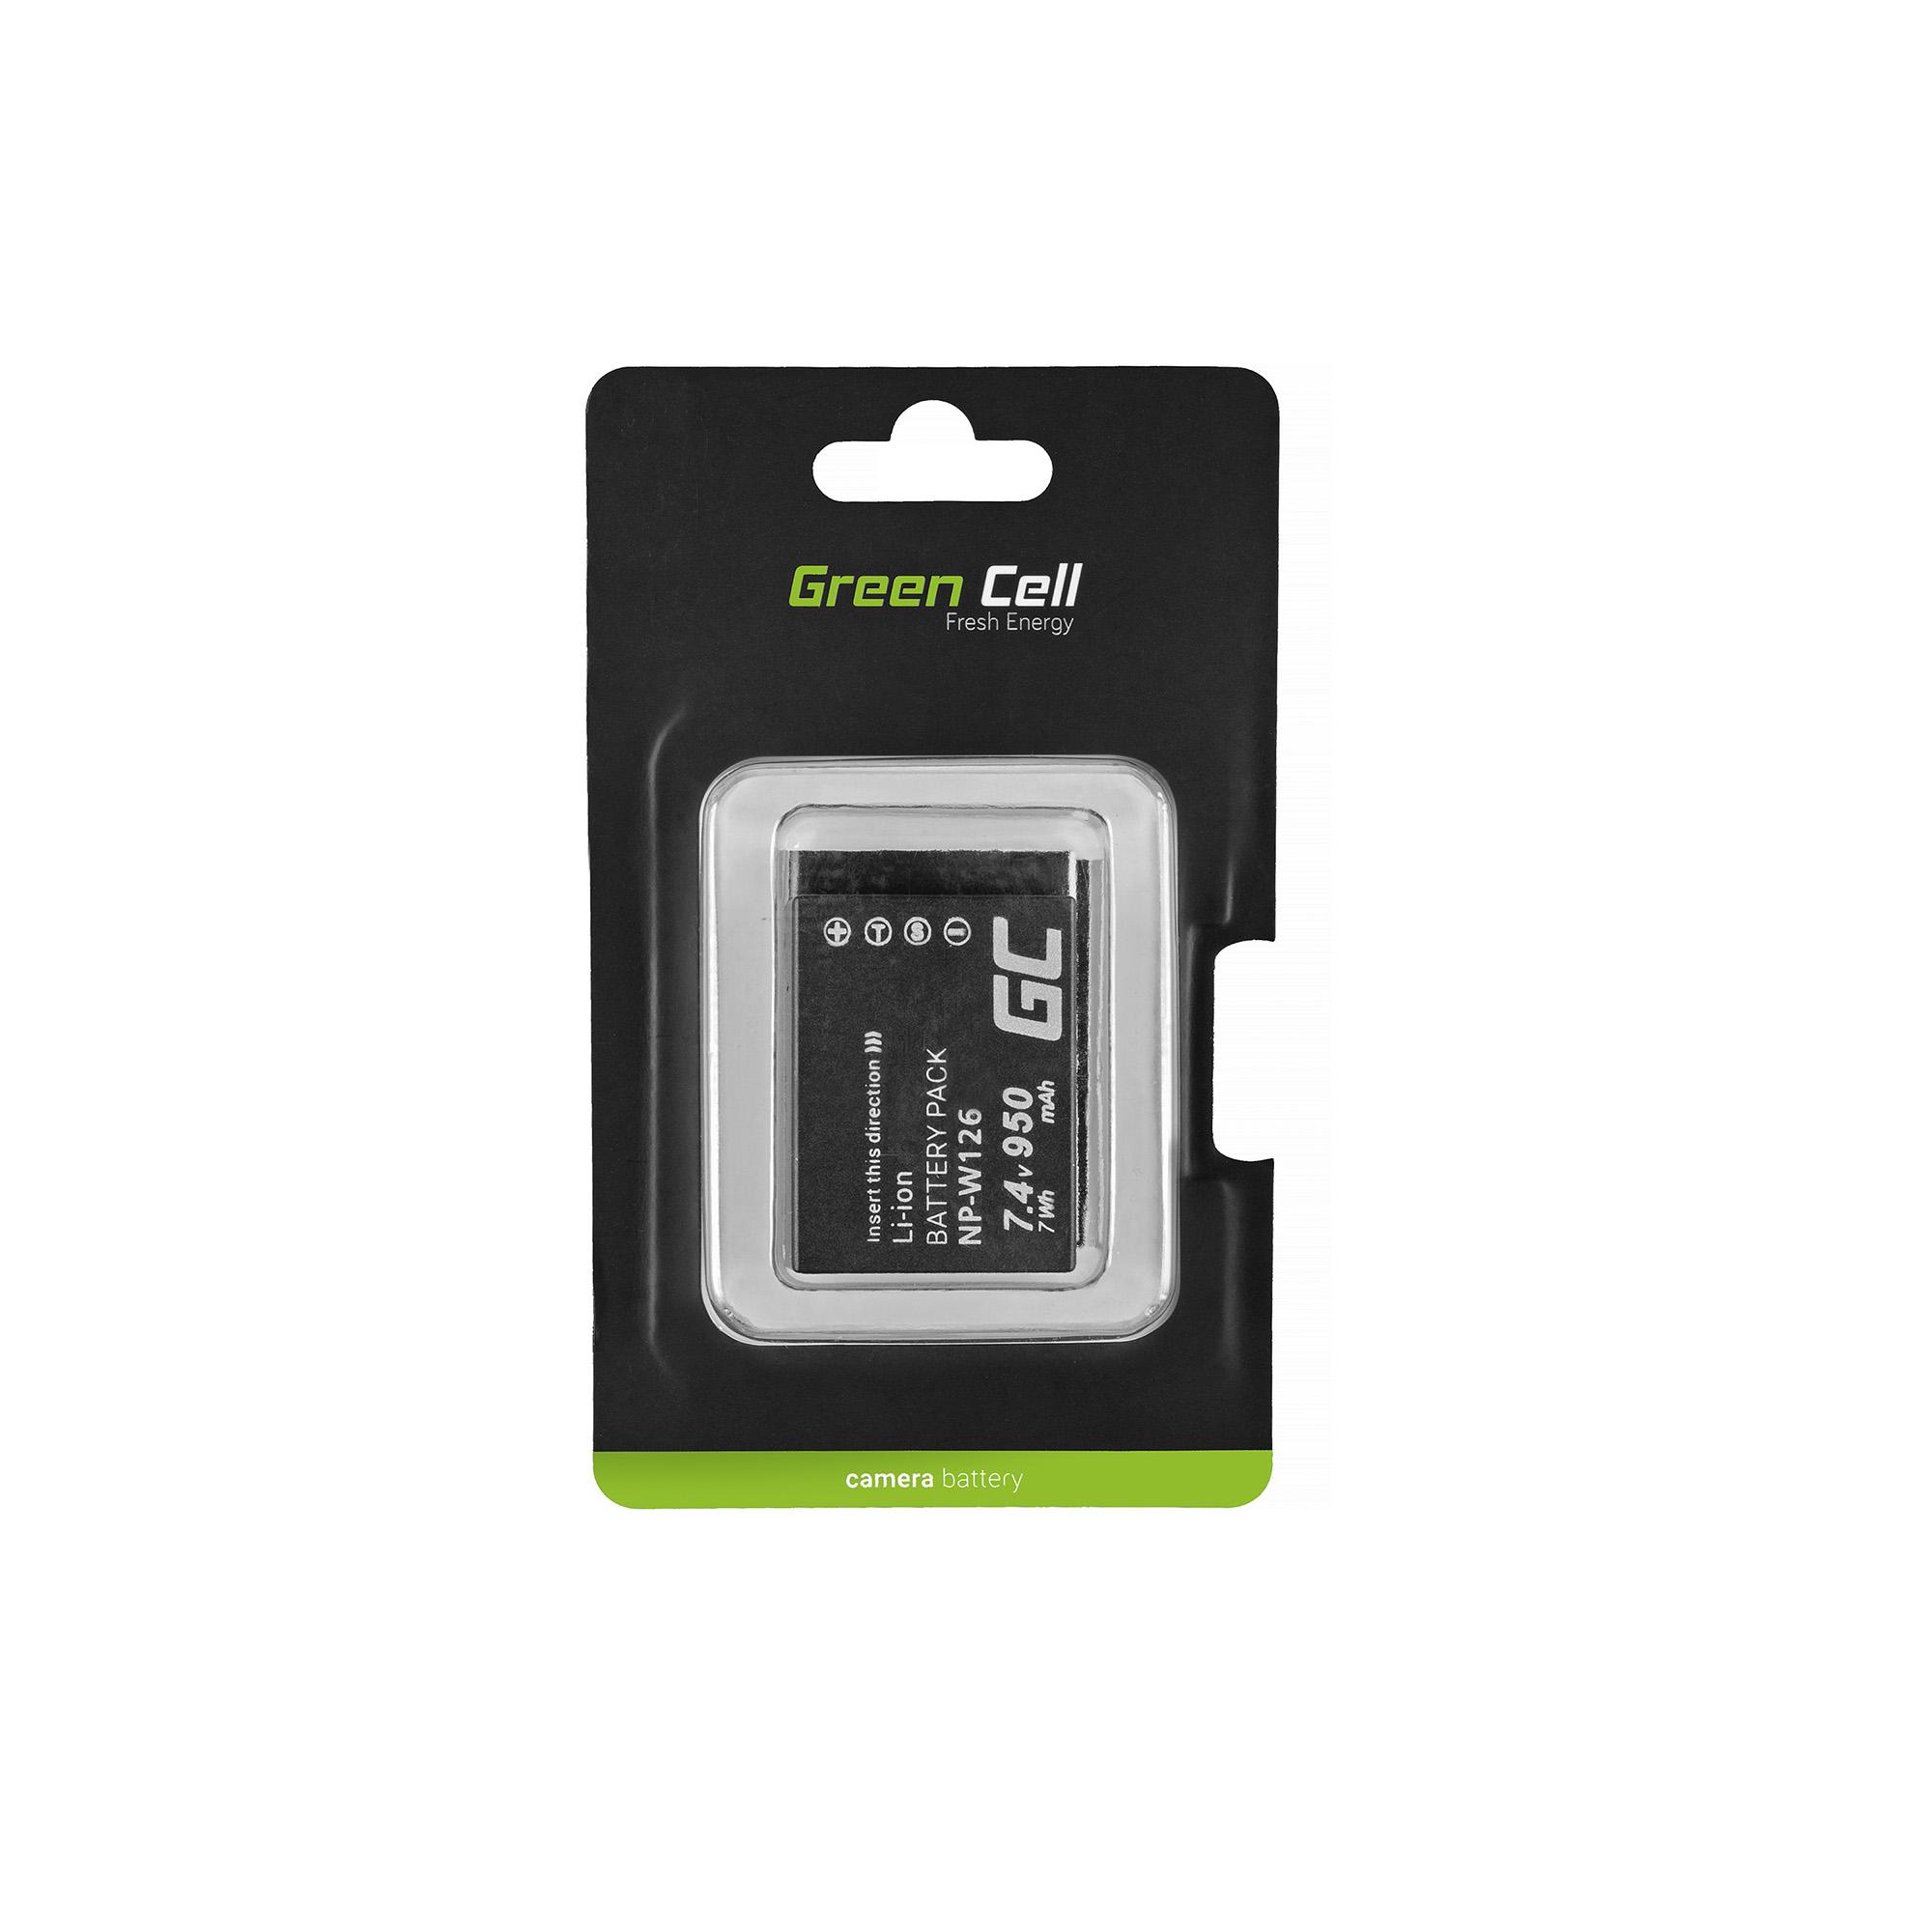 Camera Battery For Fujifilm X Pro1 Pro2 T1 T2 T20 950mah Baterai Fuji Np W126 A3 E1 Pro 1 With Packing